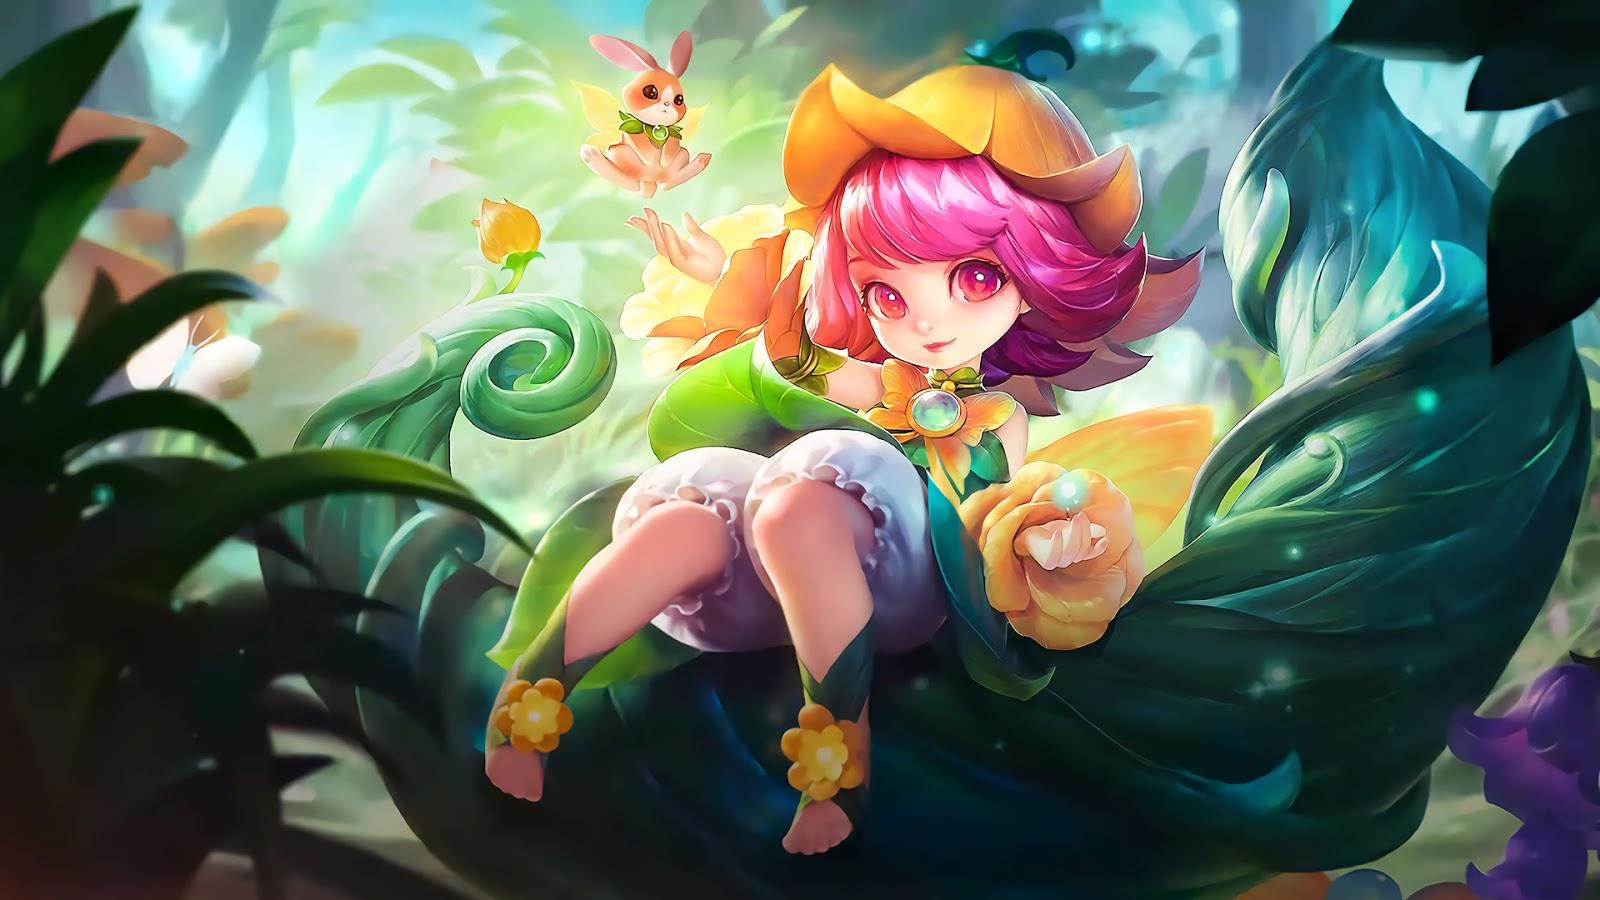 Wallpaper Chang'e Floral Elfo Skin Mobile Legends Full HD for PC